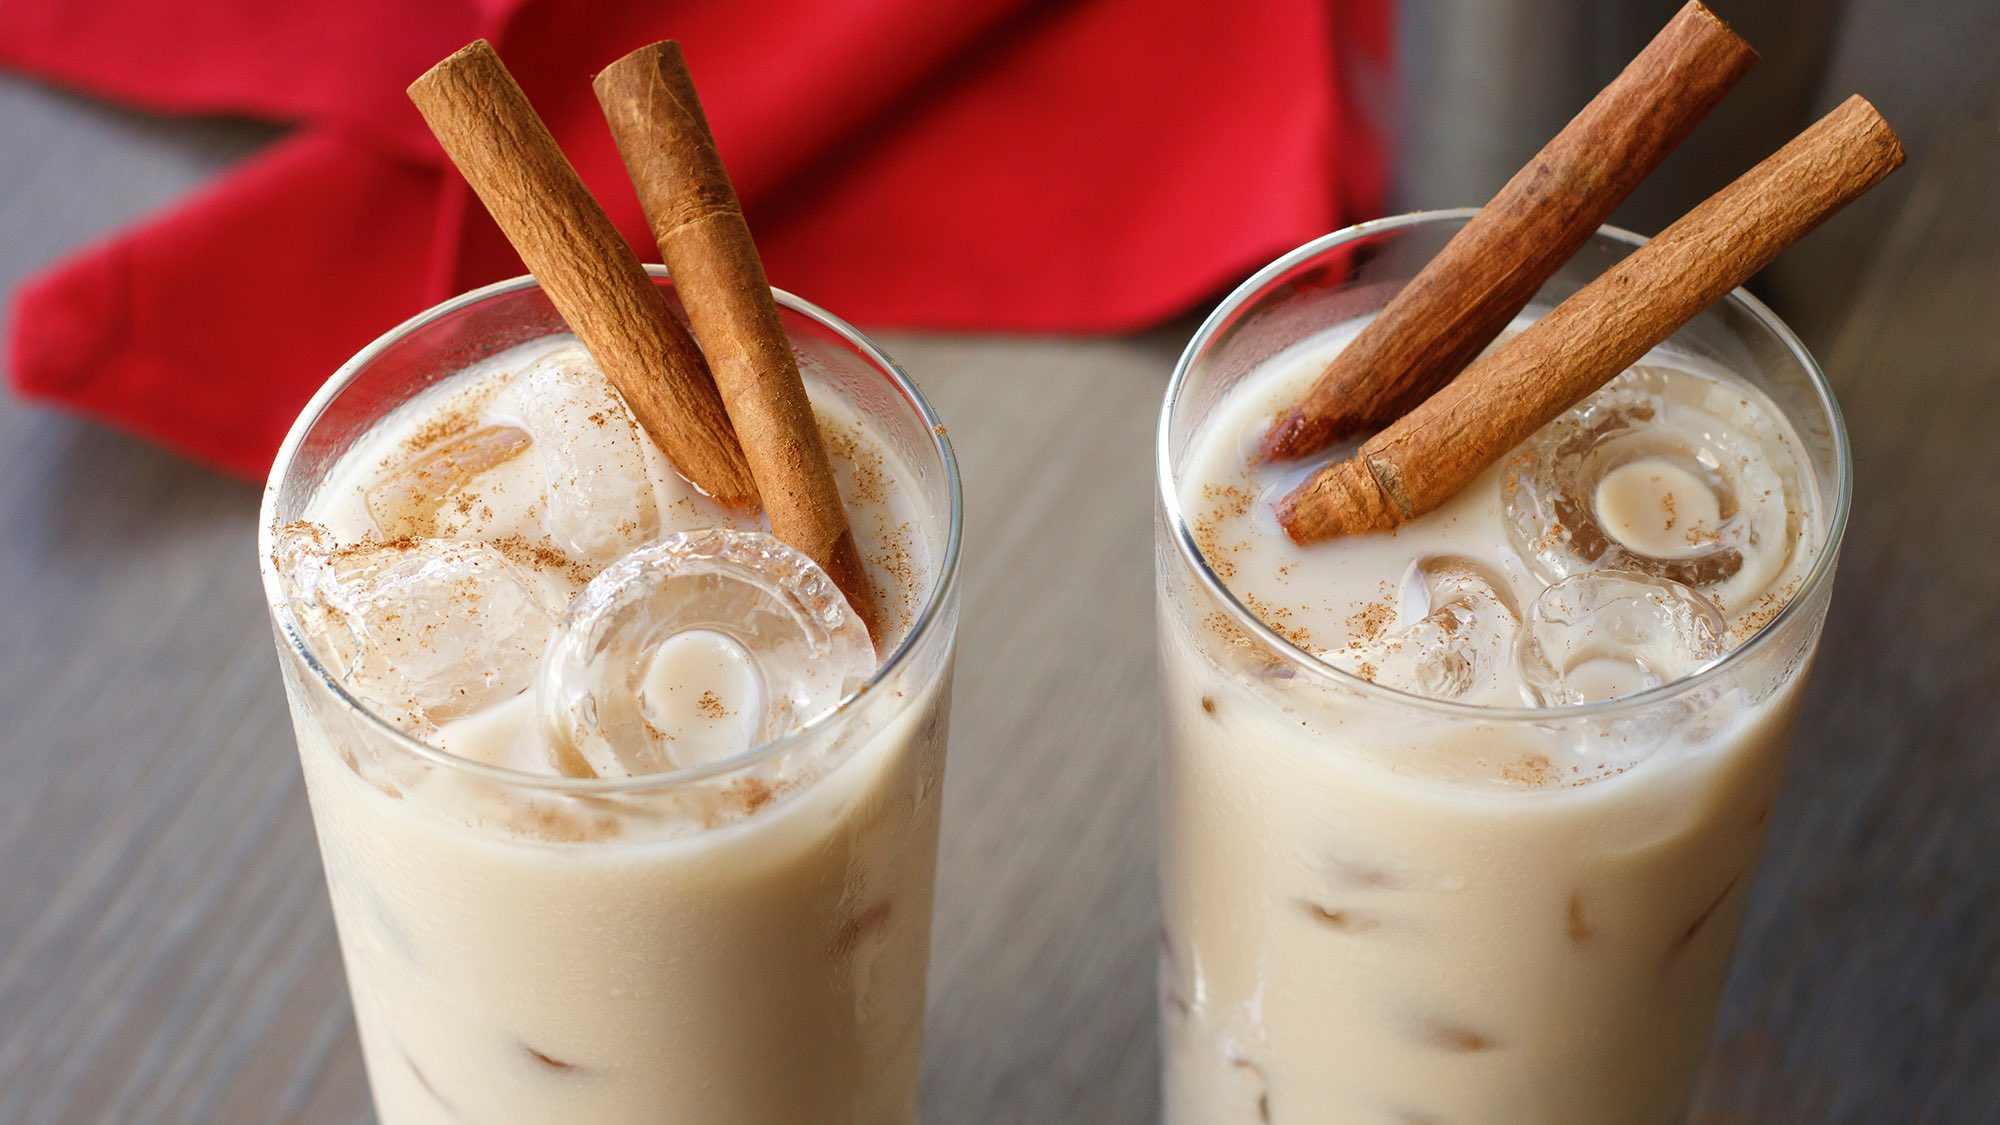 McCormick Cinnamon Spiked Iced Coffee